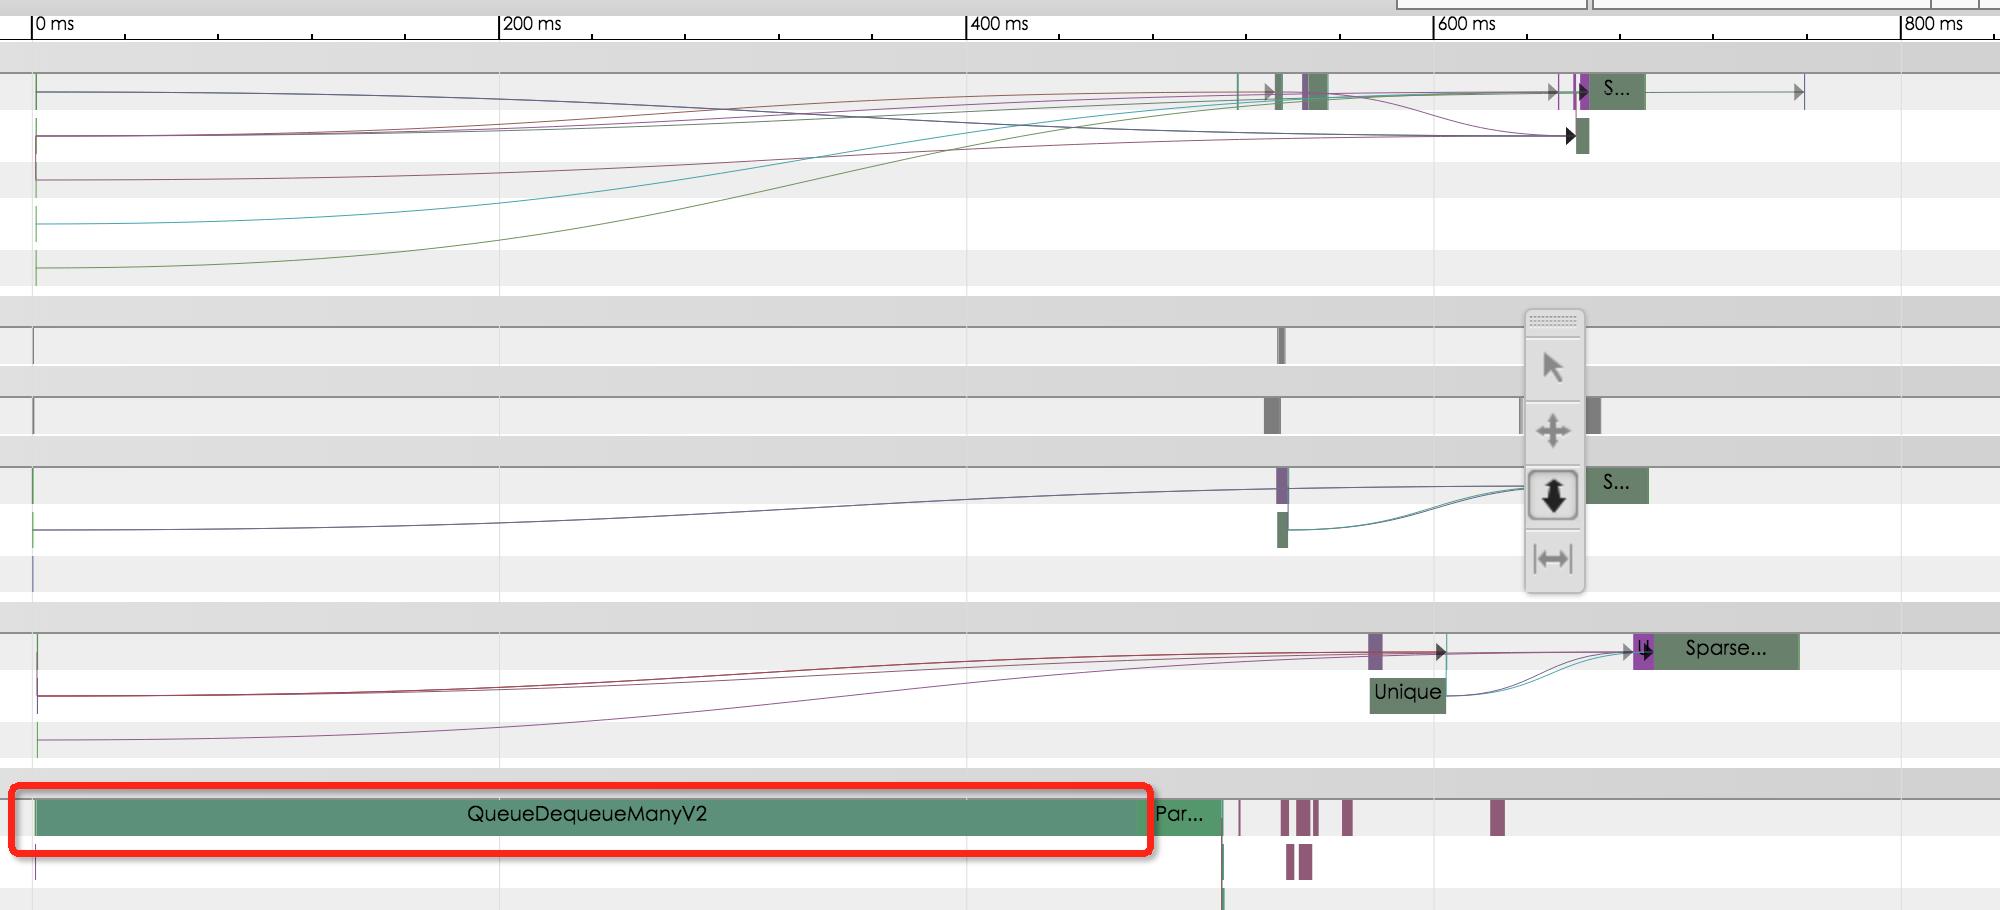 Timeline显示数据输入是性能瓶颈